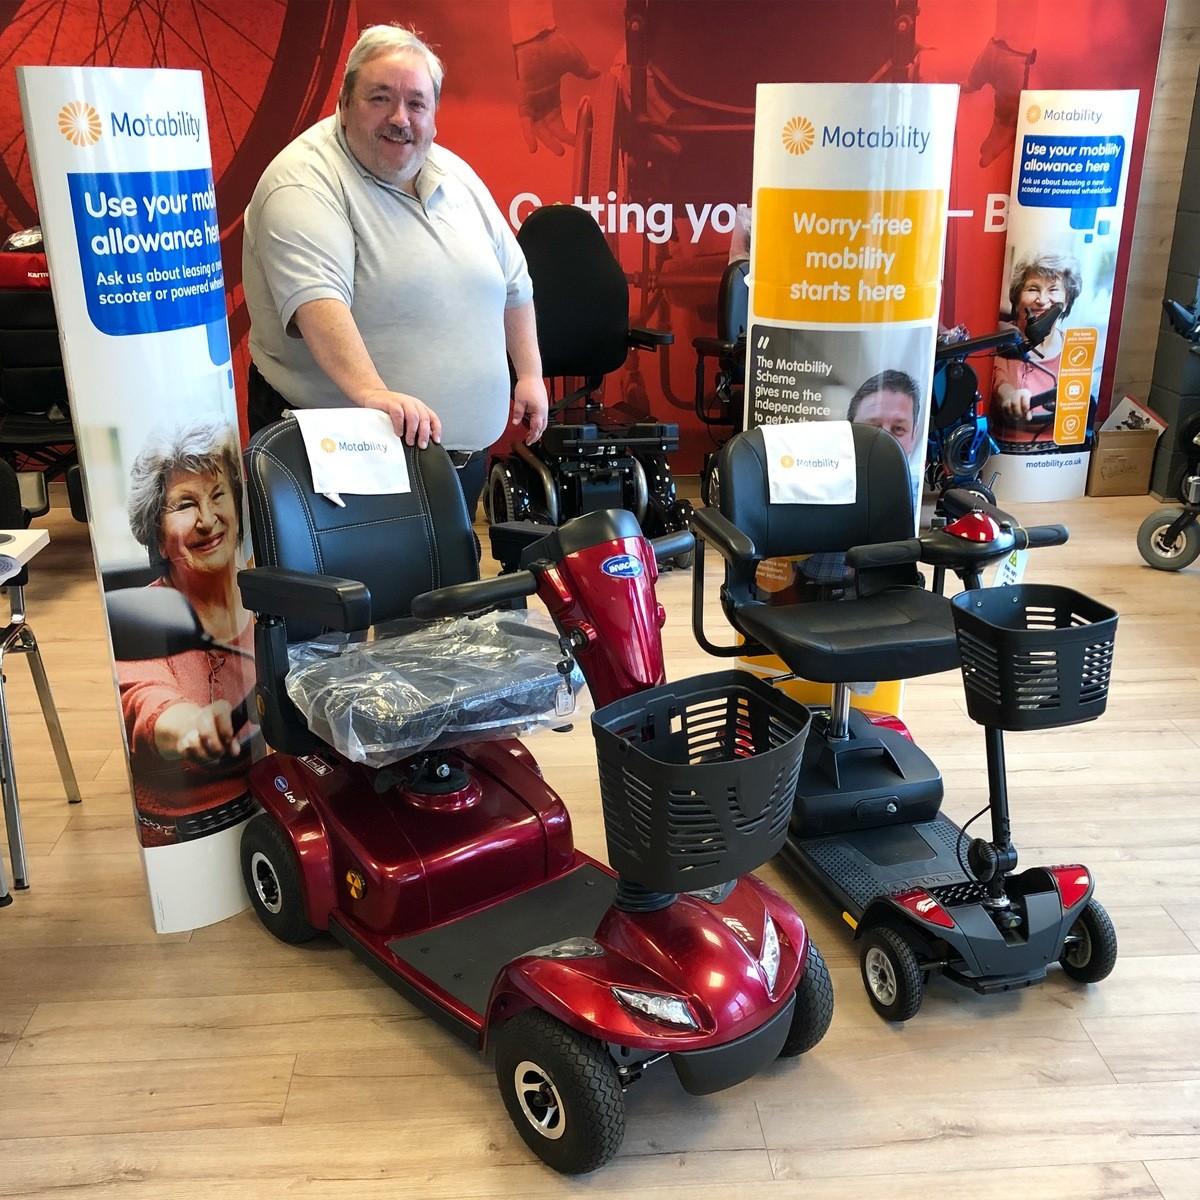 mobility scooter hire wheelchair hire antalya side belek lara alanya kemer